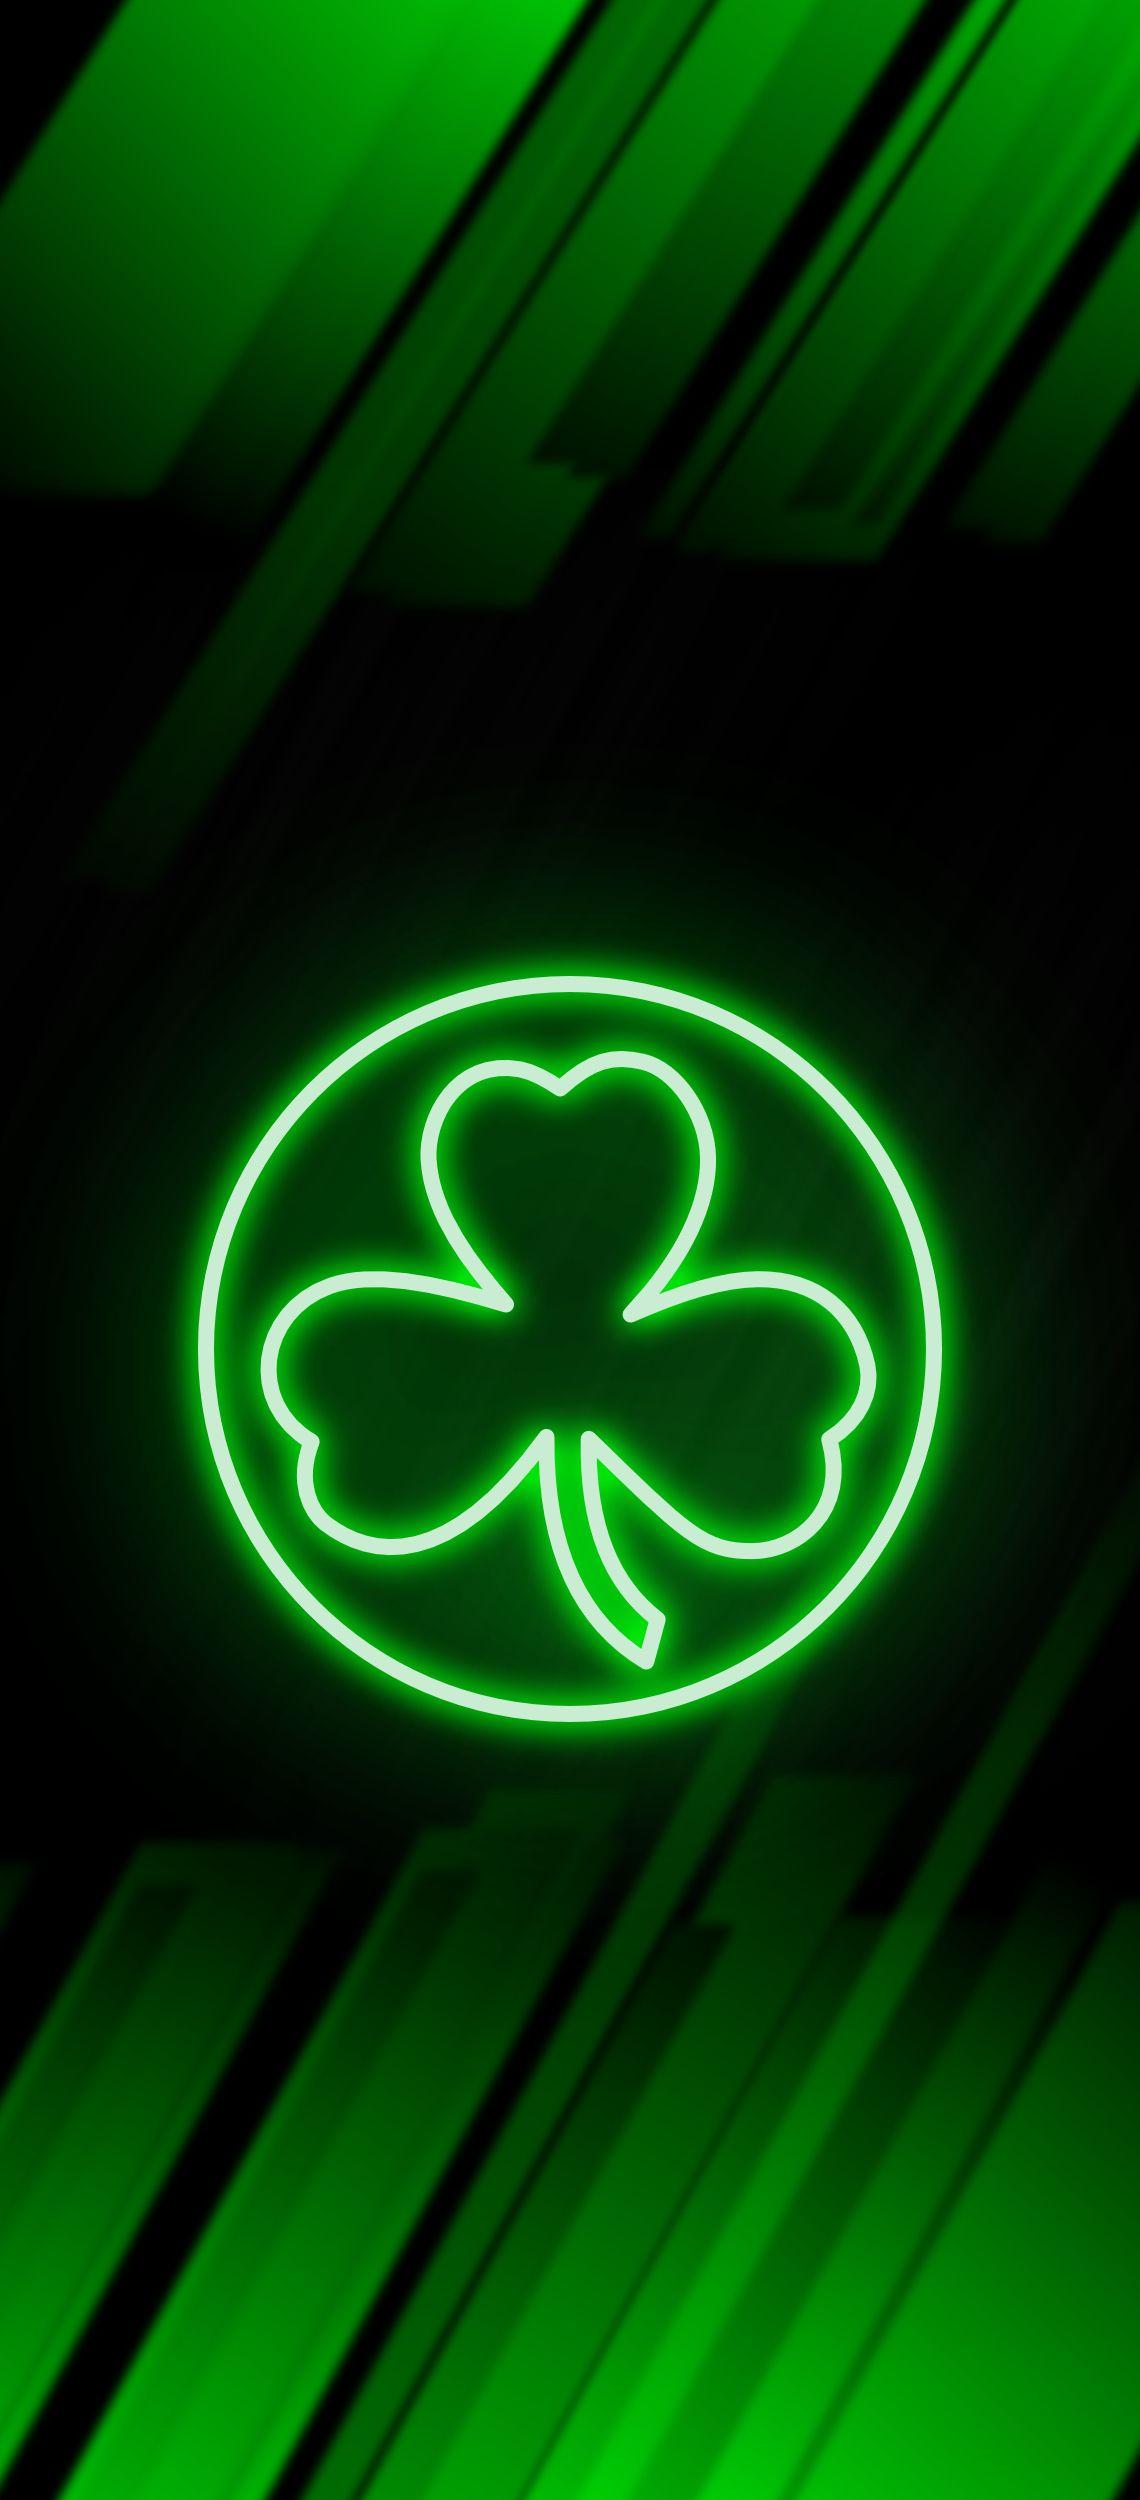 Sportsign Shop Redbubble Celtics Basketball Boston Celtics Wallpaper Boston Celtics